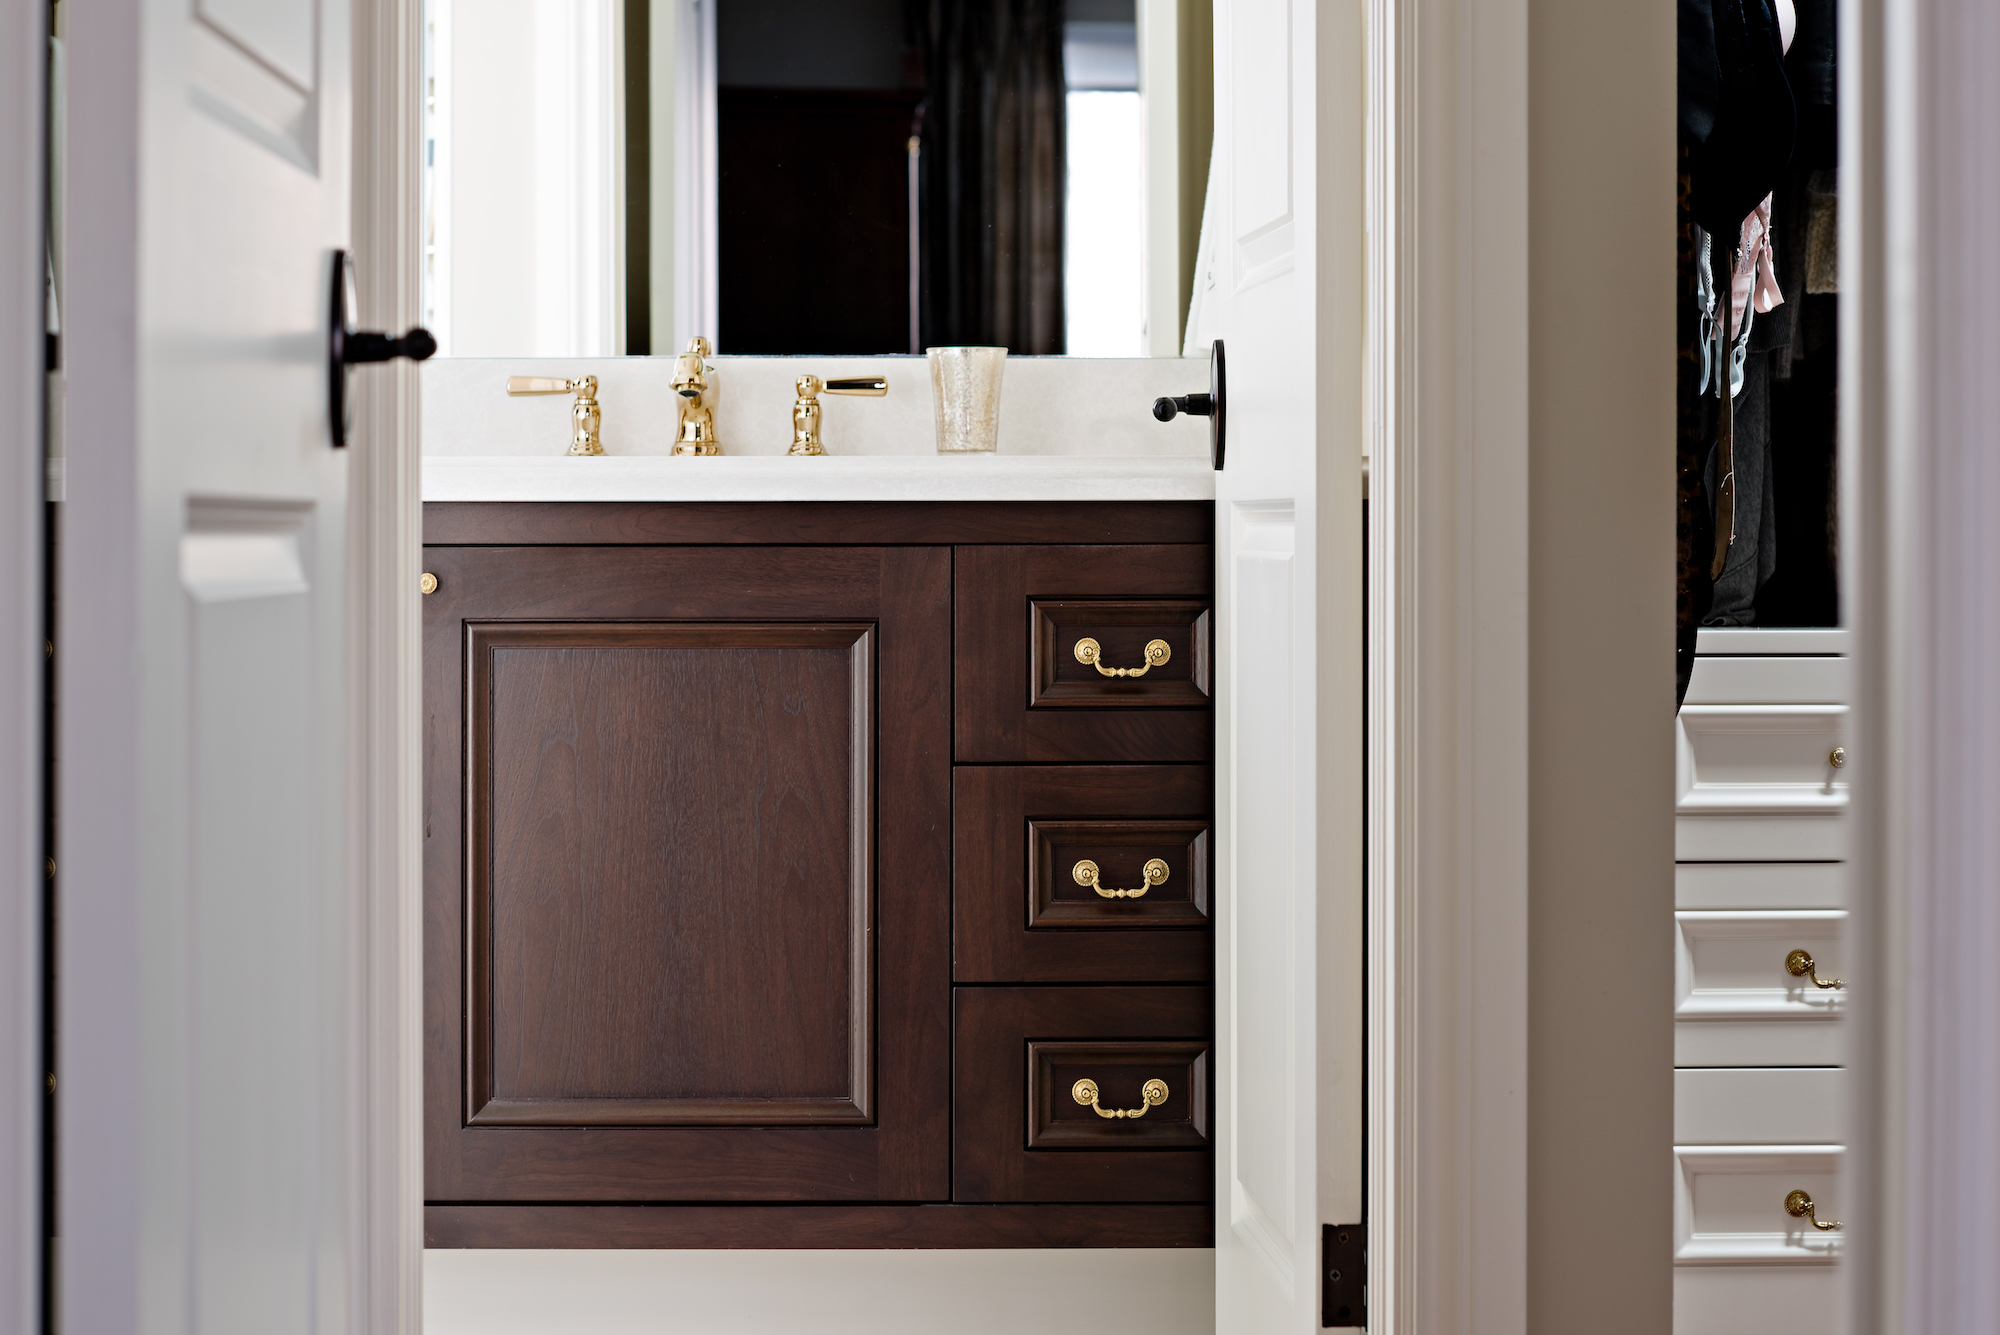 11 Pizzale Design Interior Decorating  bathroom elegant clean simple dark wood custom millwork gold hardware.jpg